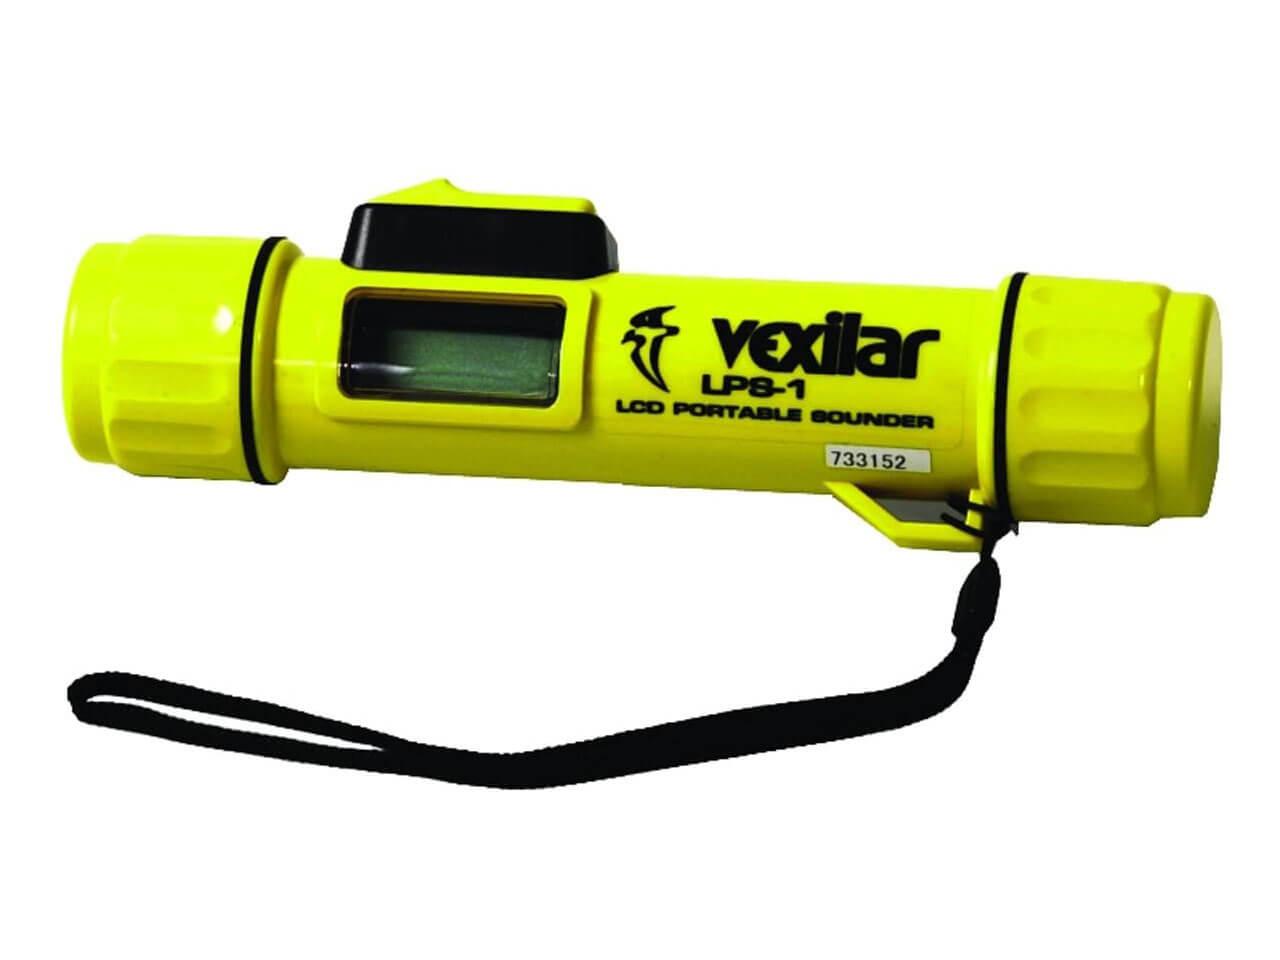 Portable Depth Sounder